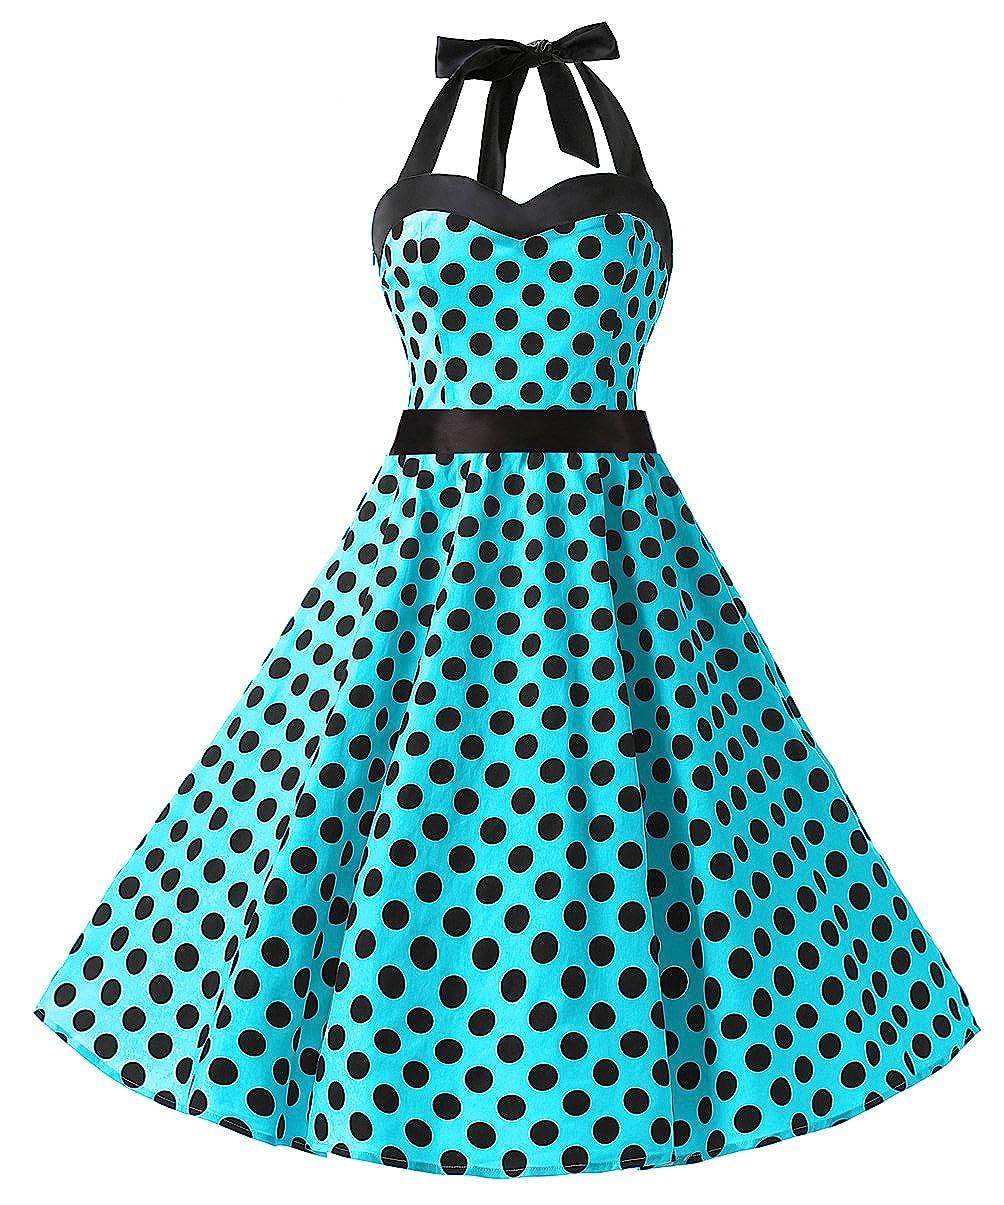 TALLA 3XL. Dresstells® Halter 50s Rockabilly Polka Dots Audrey Dress Retro Cocktail Dress Blue Black Dot 3XL